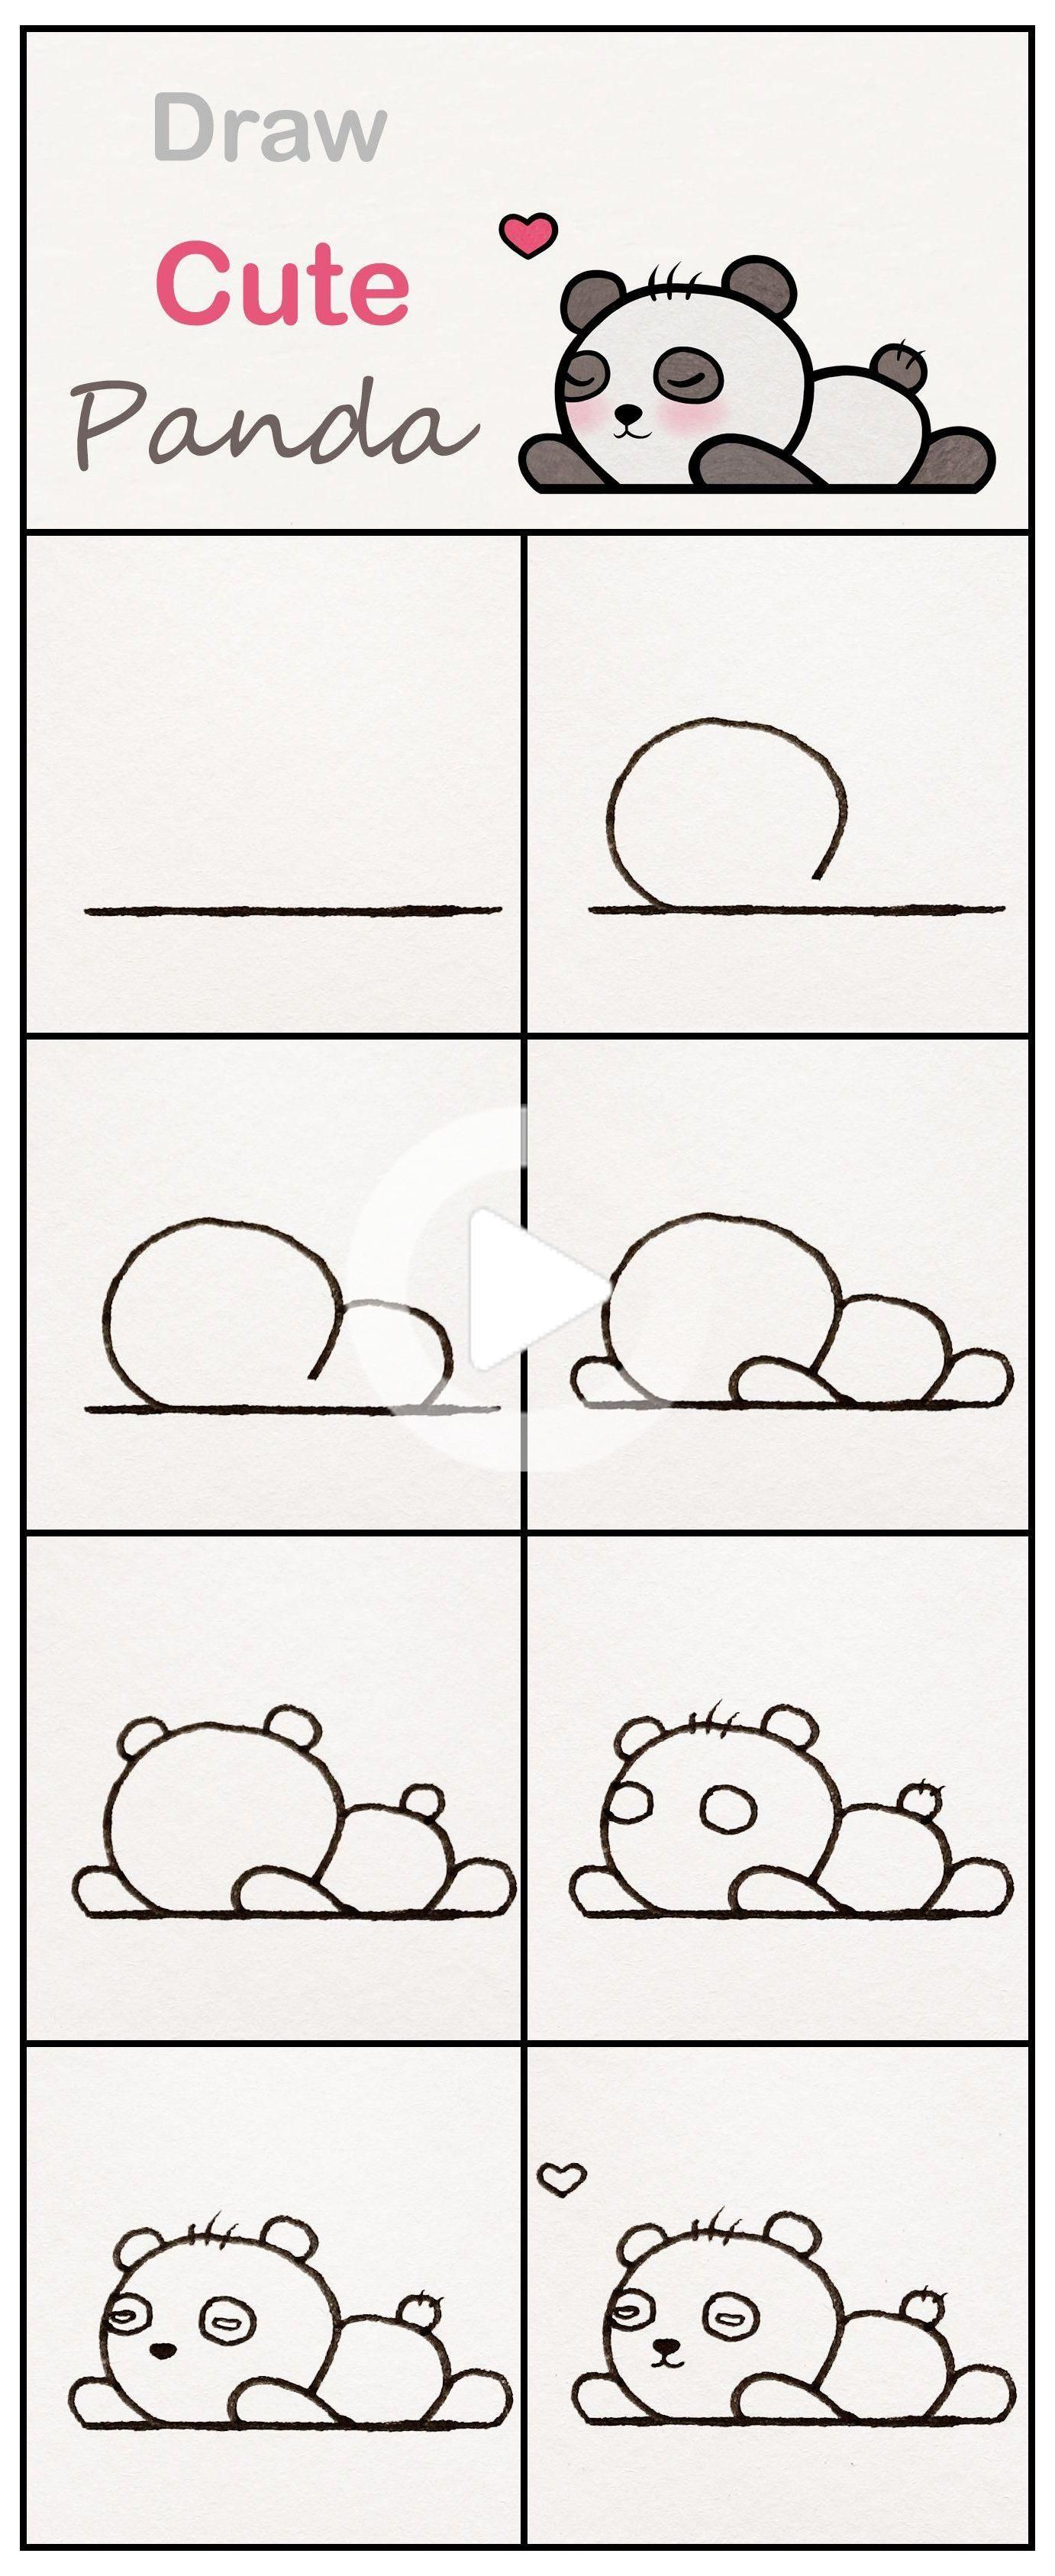 Learn How To Draw A Cute Baby Panda Step By Step Very Simple Tutorial Panda Drawings Kawaii Easy Drawings Cute Drawings Cute Panda Baby